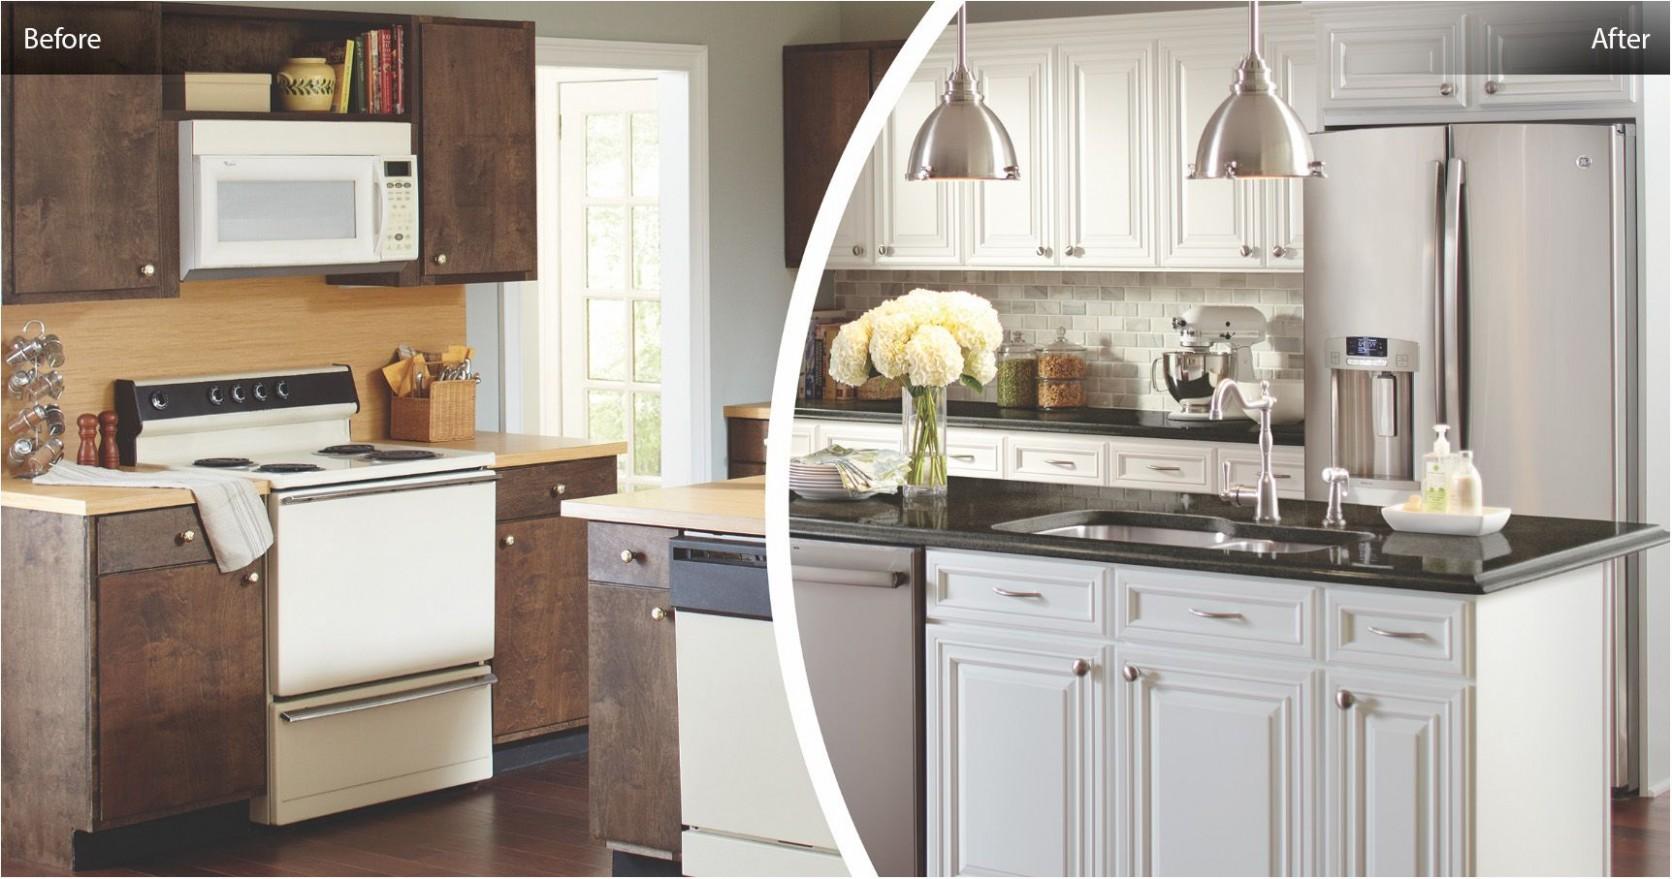 Cabinet painting Calgary  Cabinet Refinishing & kitchen cabinet  - Kitchen Cabinets Refinishing Services